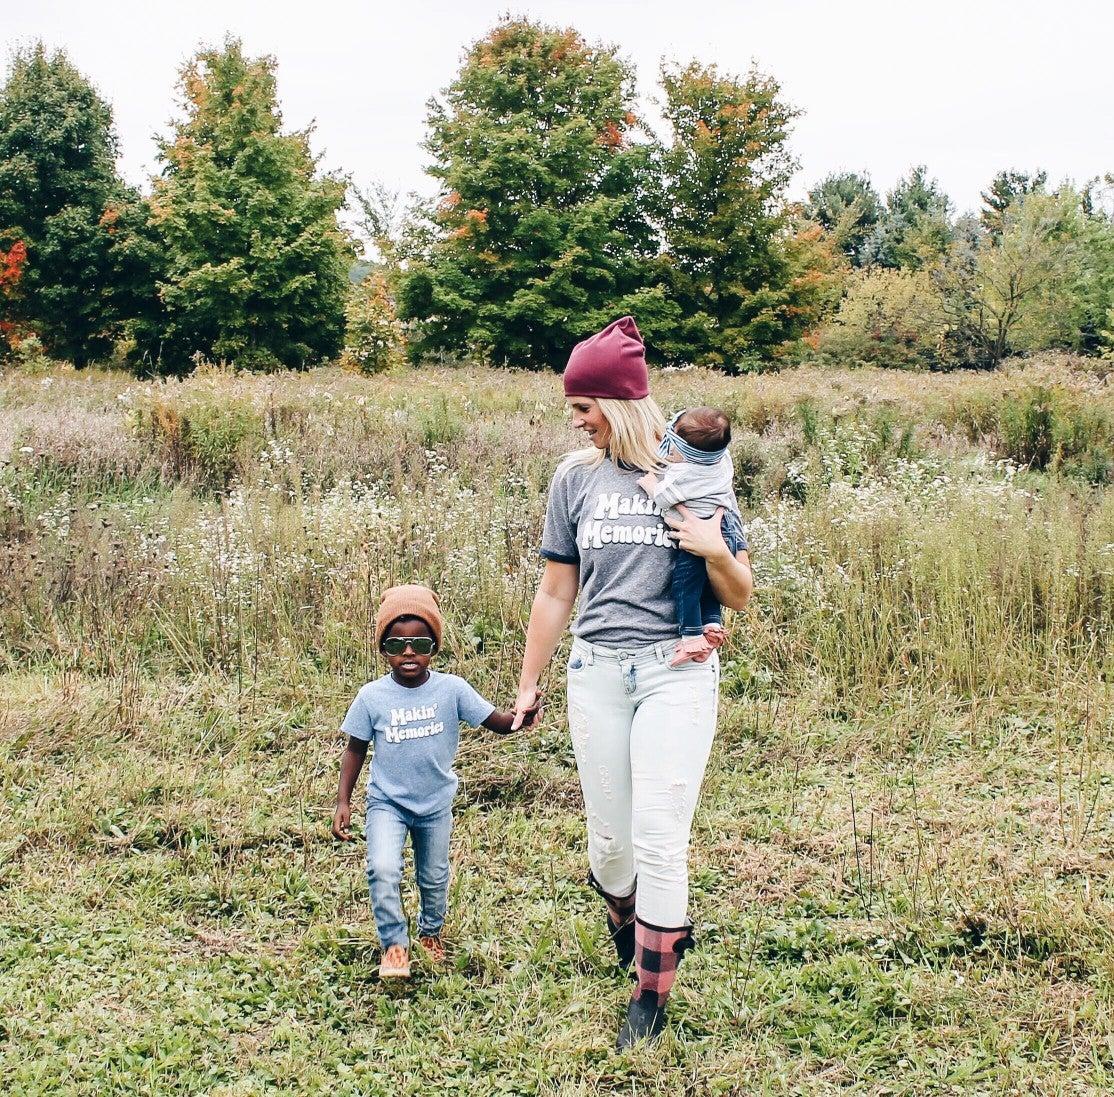 infertile couples speak of adoption process beginning the process